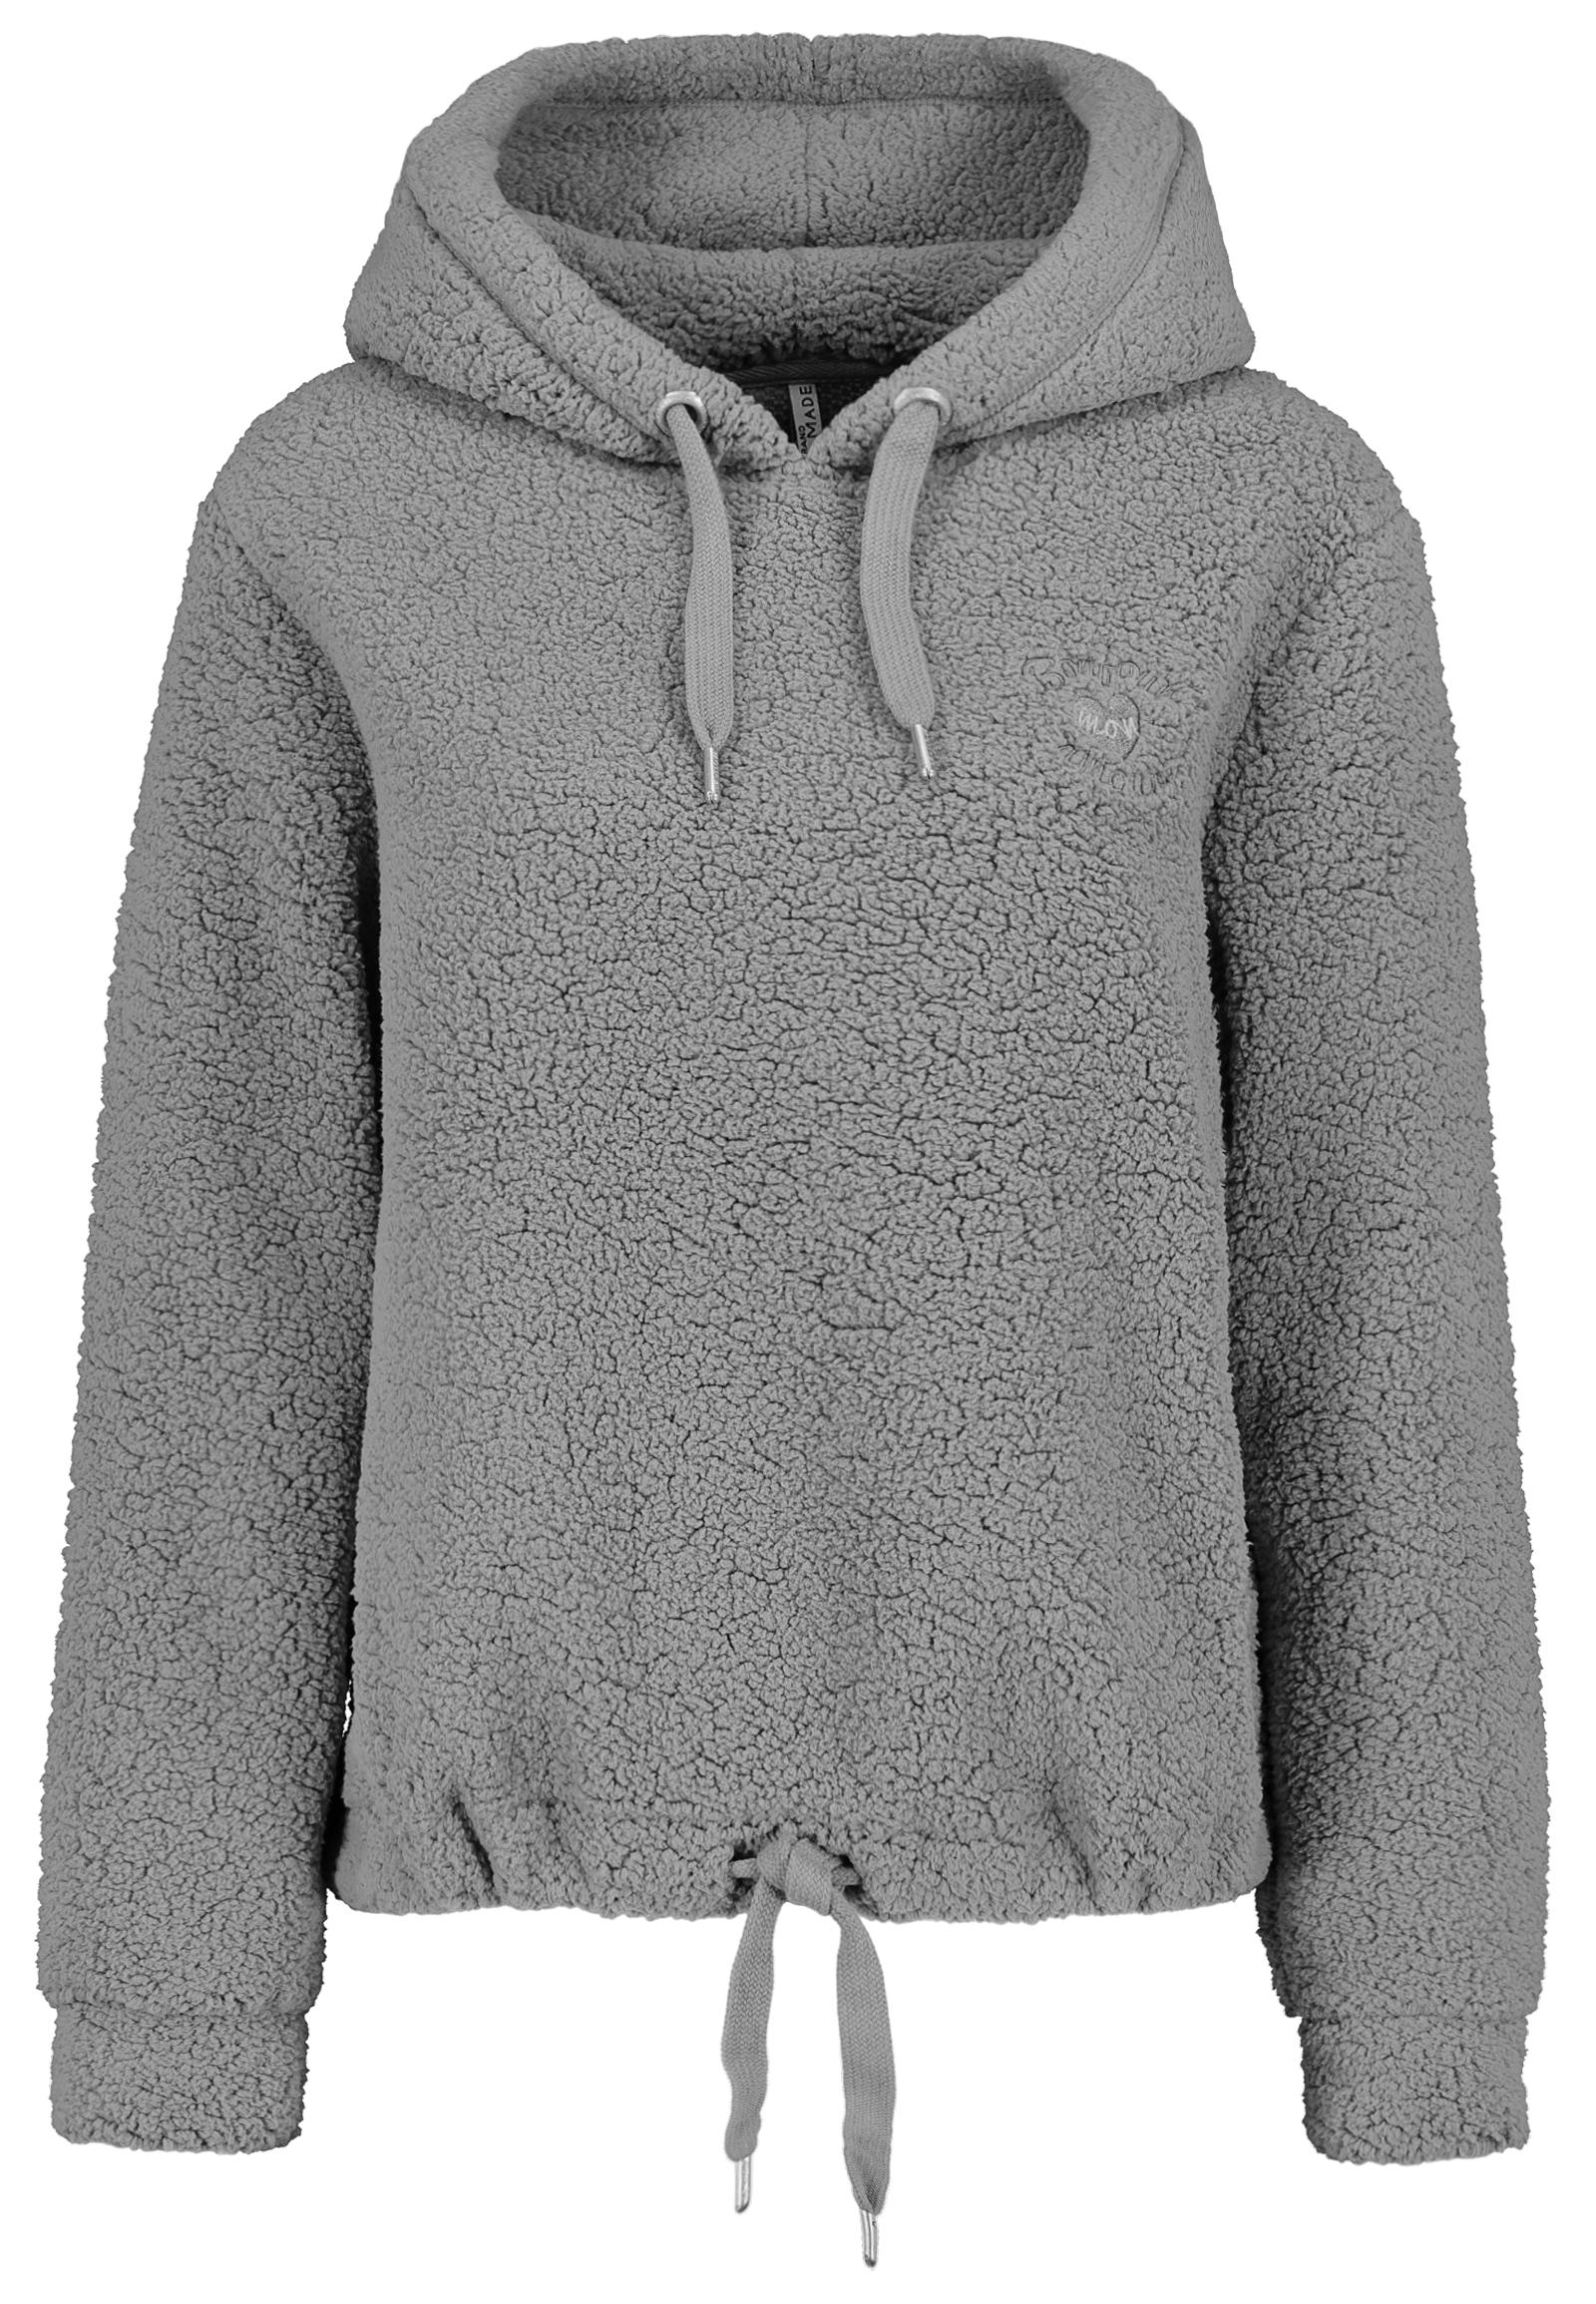 Fresh Made Fleecepullover | Sportbekleidung > Fleecepullover | Grau | Fresh Made